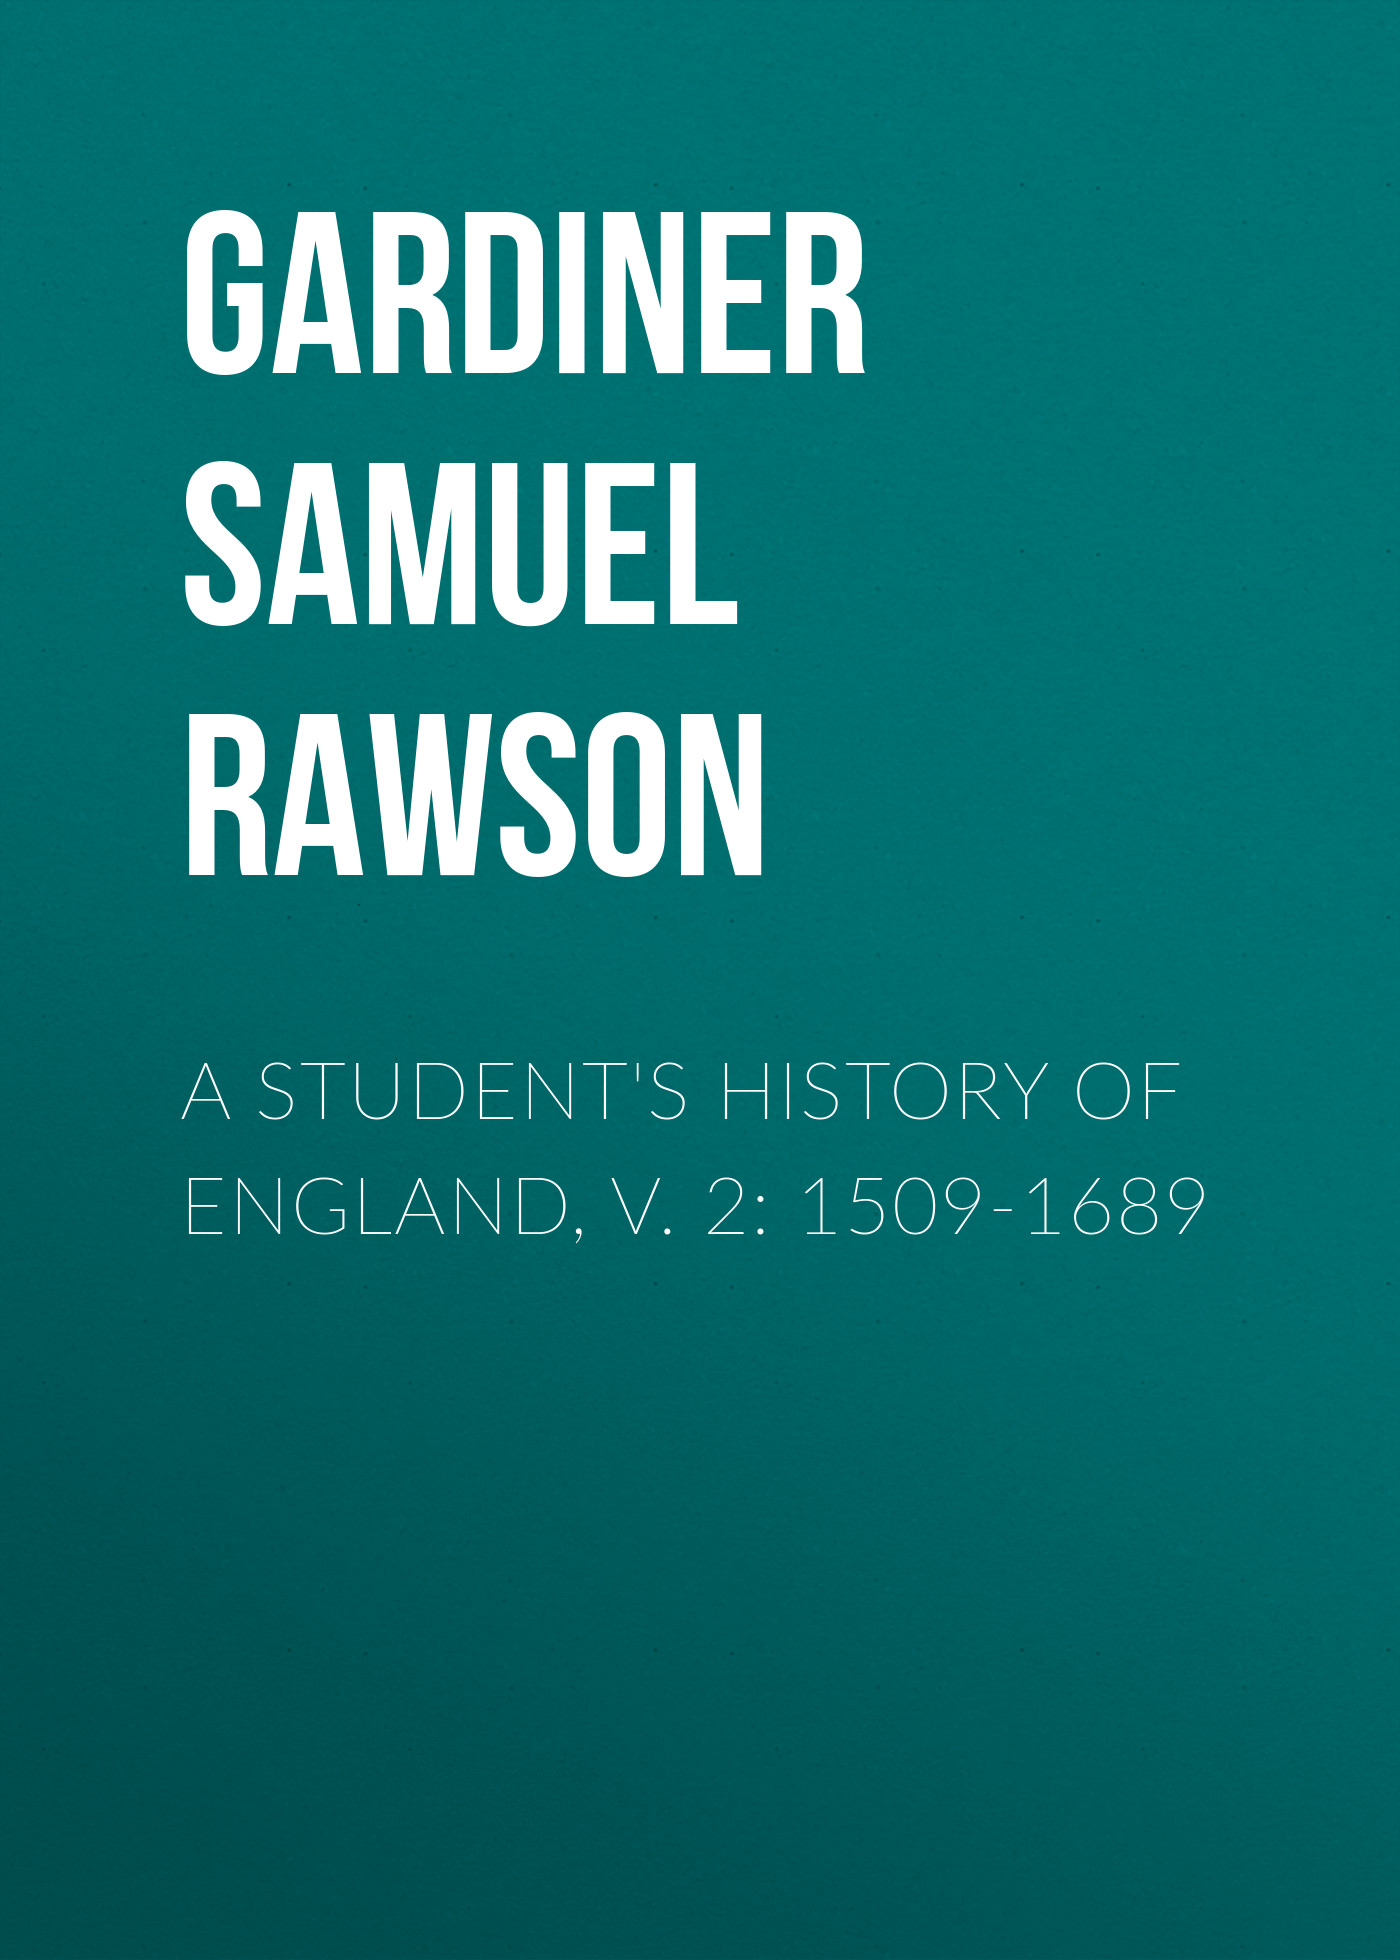 Gardiner Samuel Rawson A Student's History of England, v. 2: 1509-1689 ayres samuel gardiner the expositor s bible index